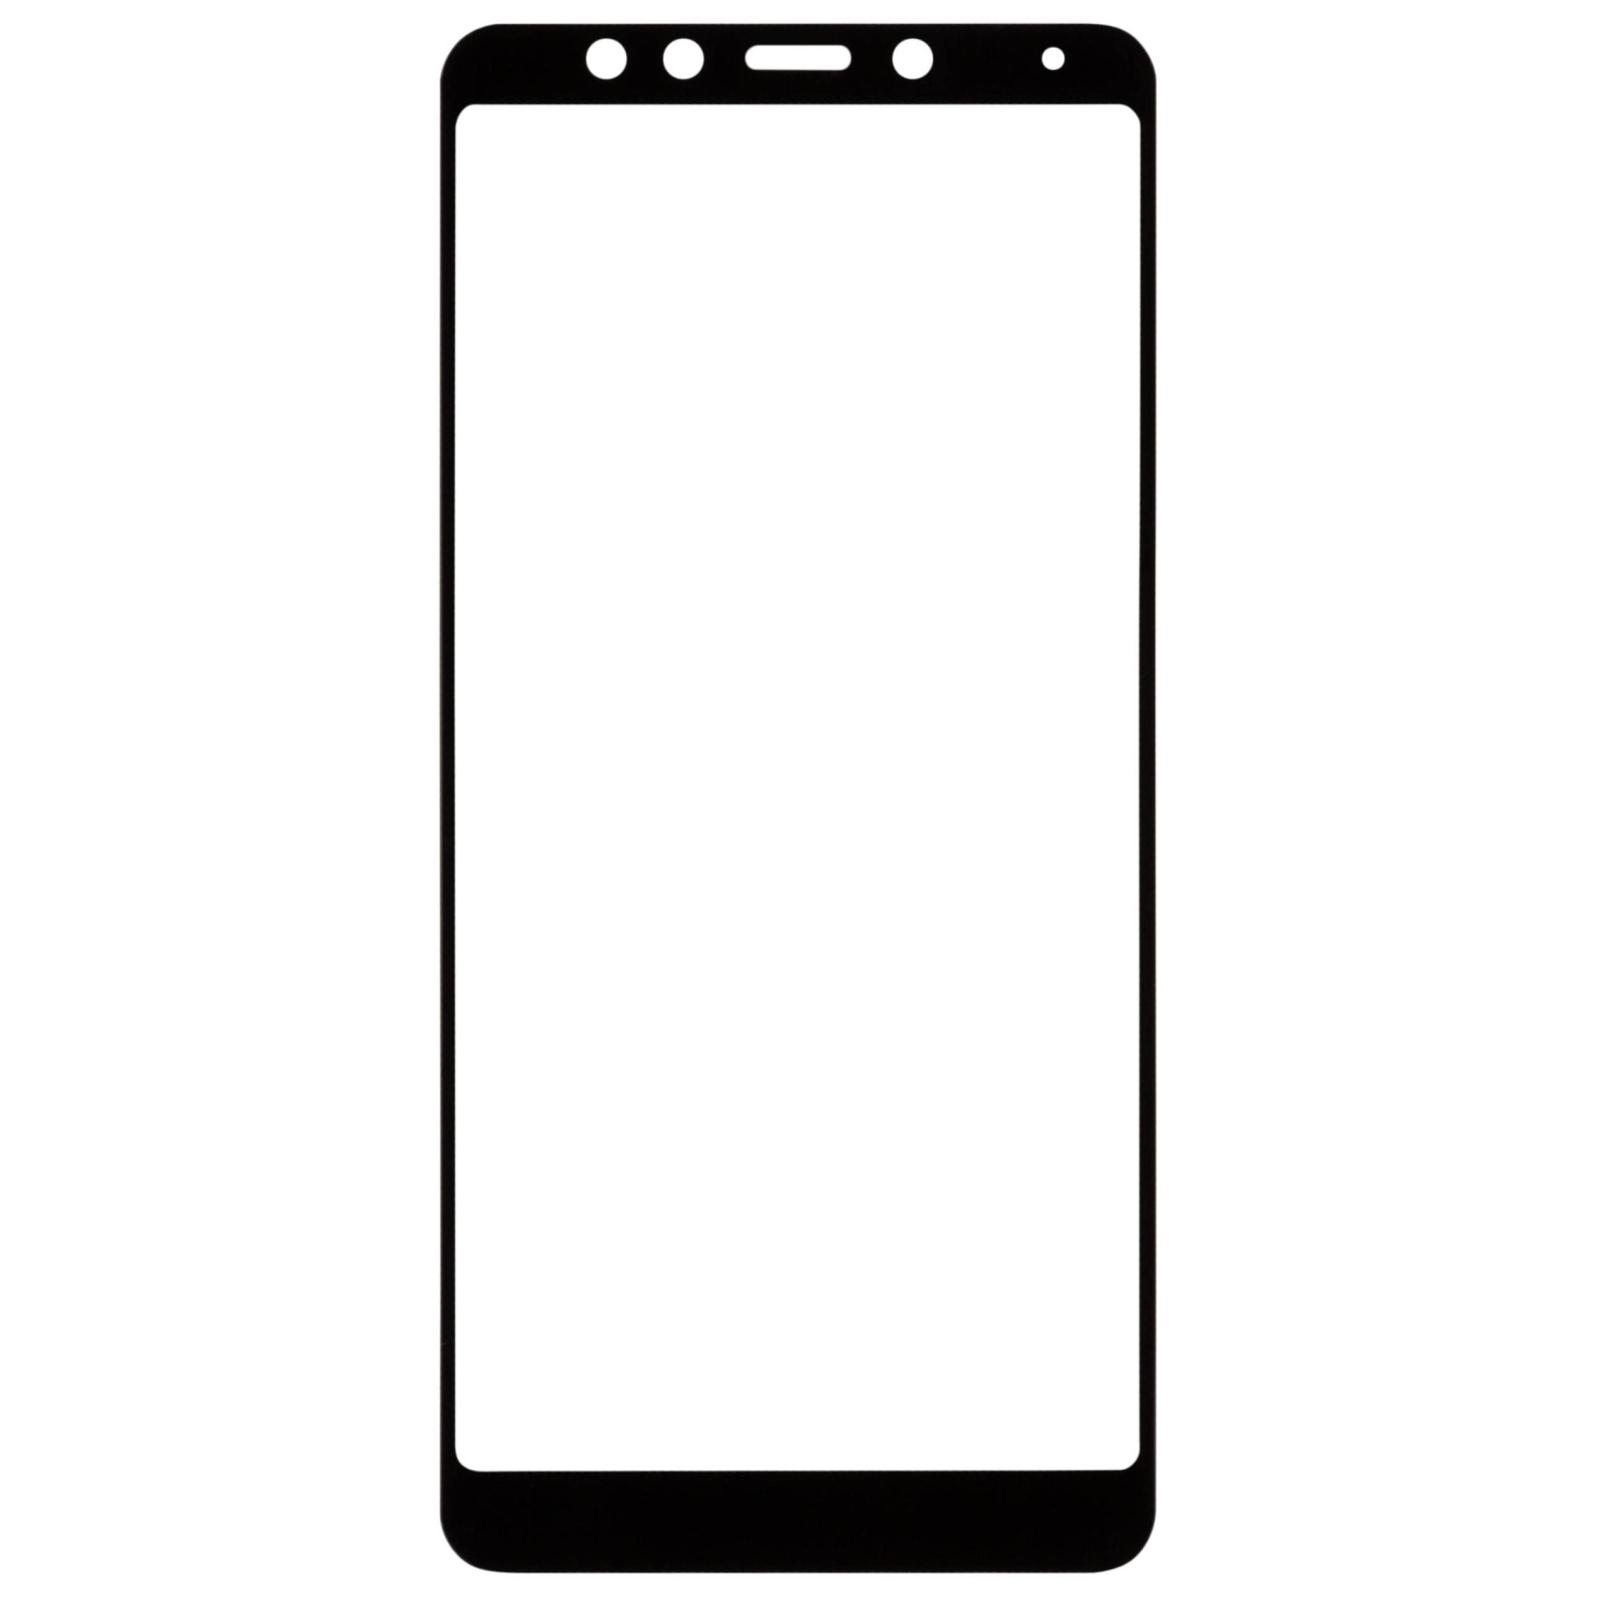 Стекло защитное MakeFuture для Xiaomi Redmi 5 Plus Black Full Cover (MGFC-XR5PB) изображение 3